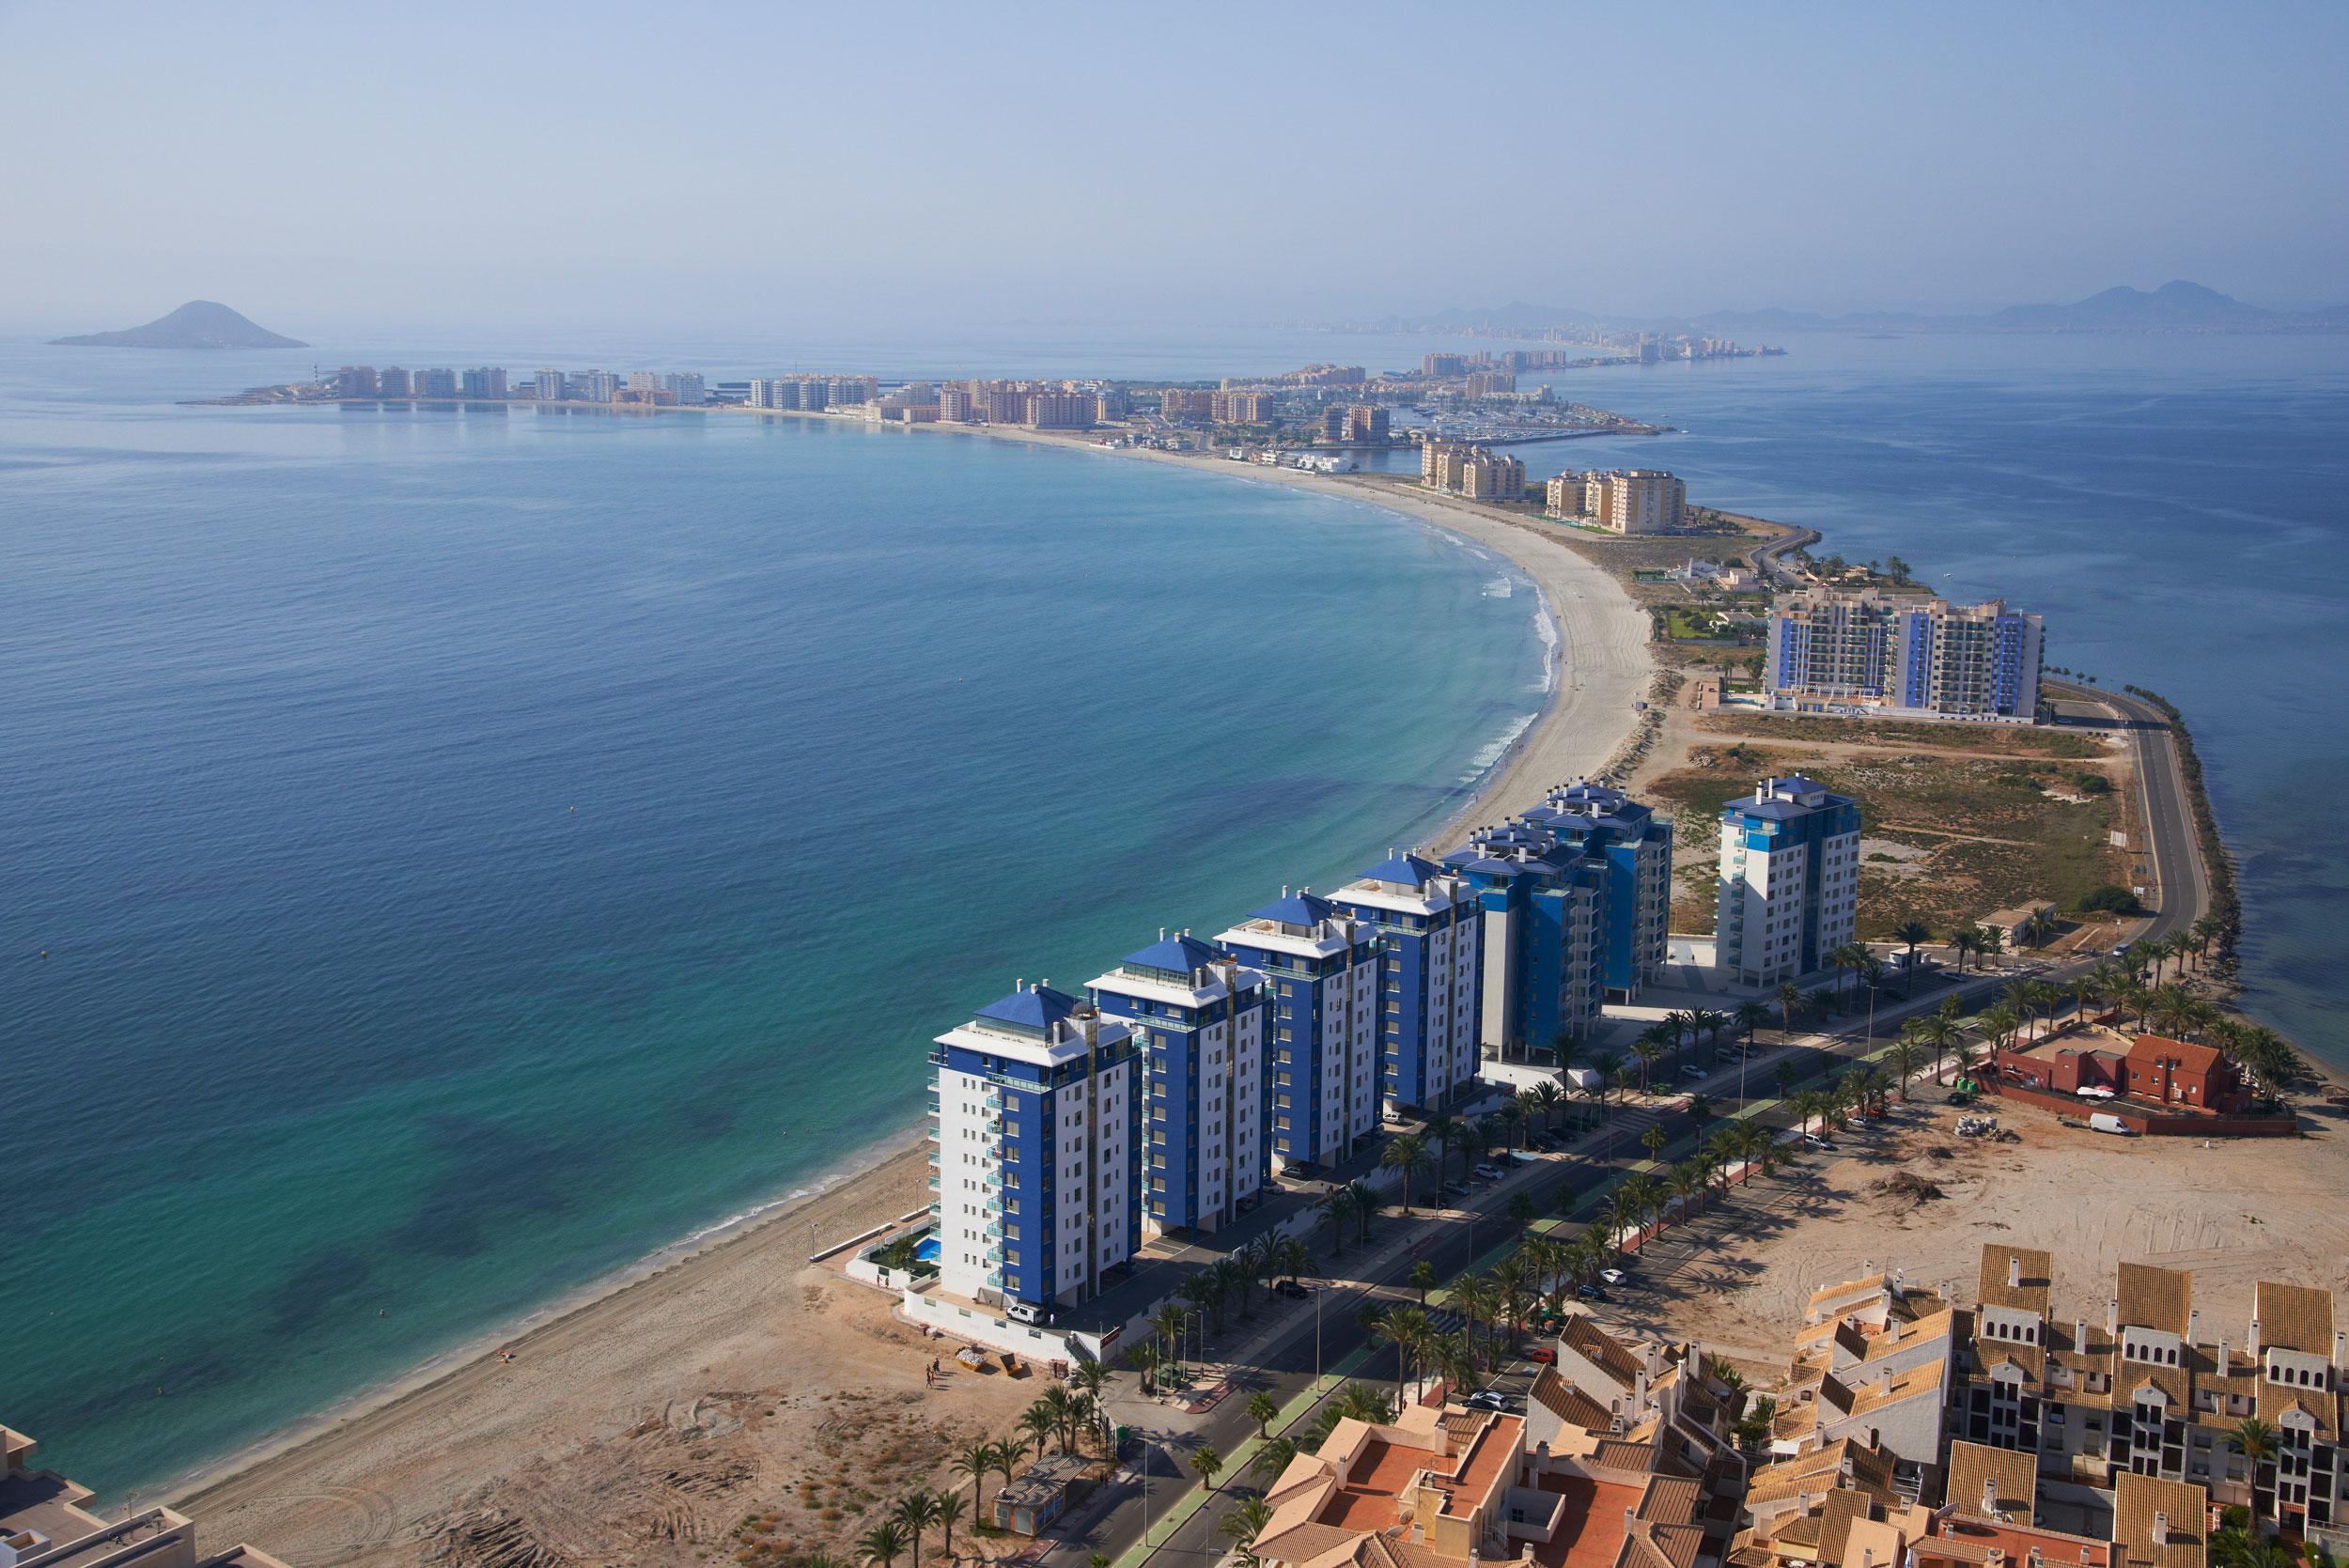 Nieuwbouw in La Manga del Mar Menor (Spanje, Costa Calida)